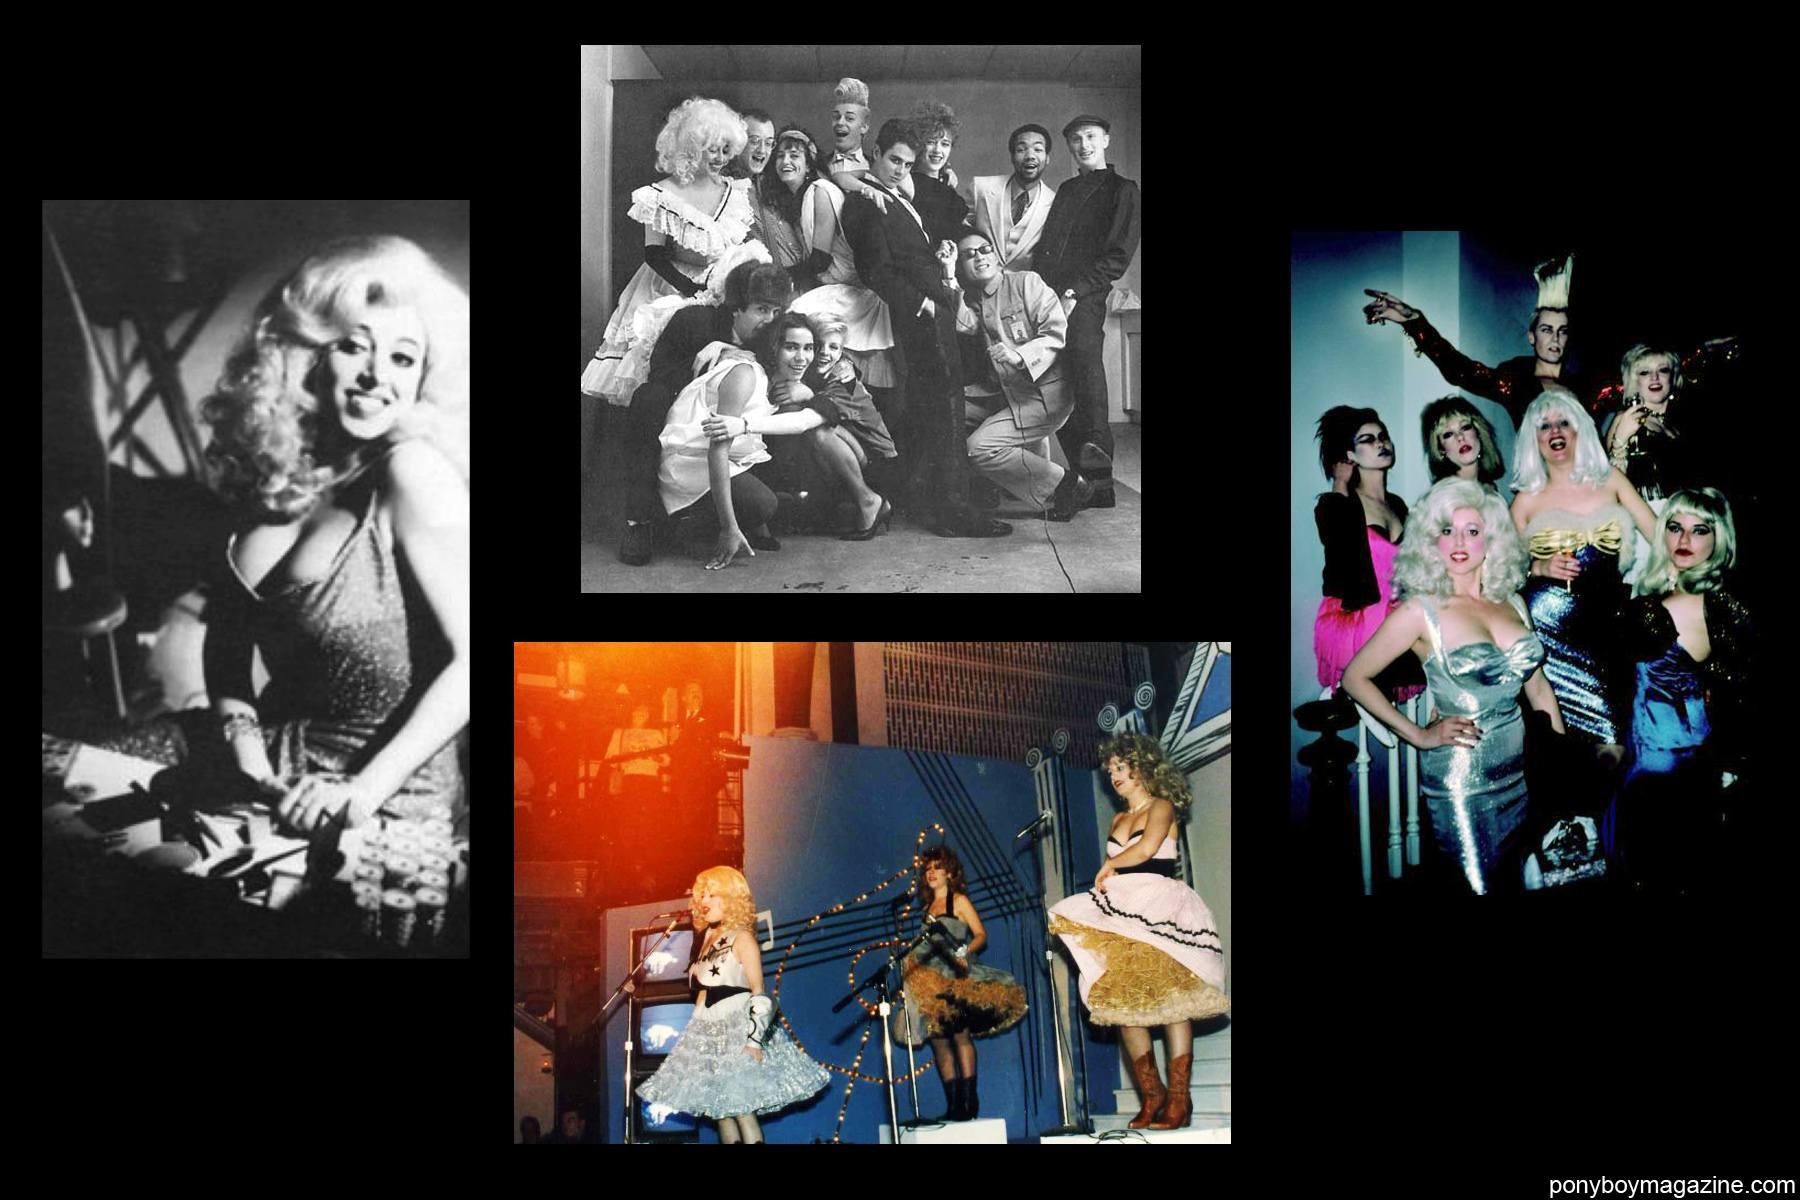 Photos of legendary performers Katy K and John Sex for Ponyboy Magazine.